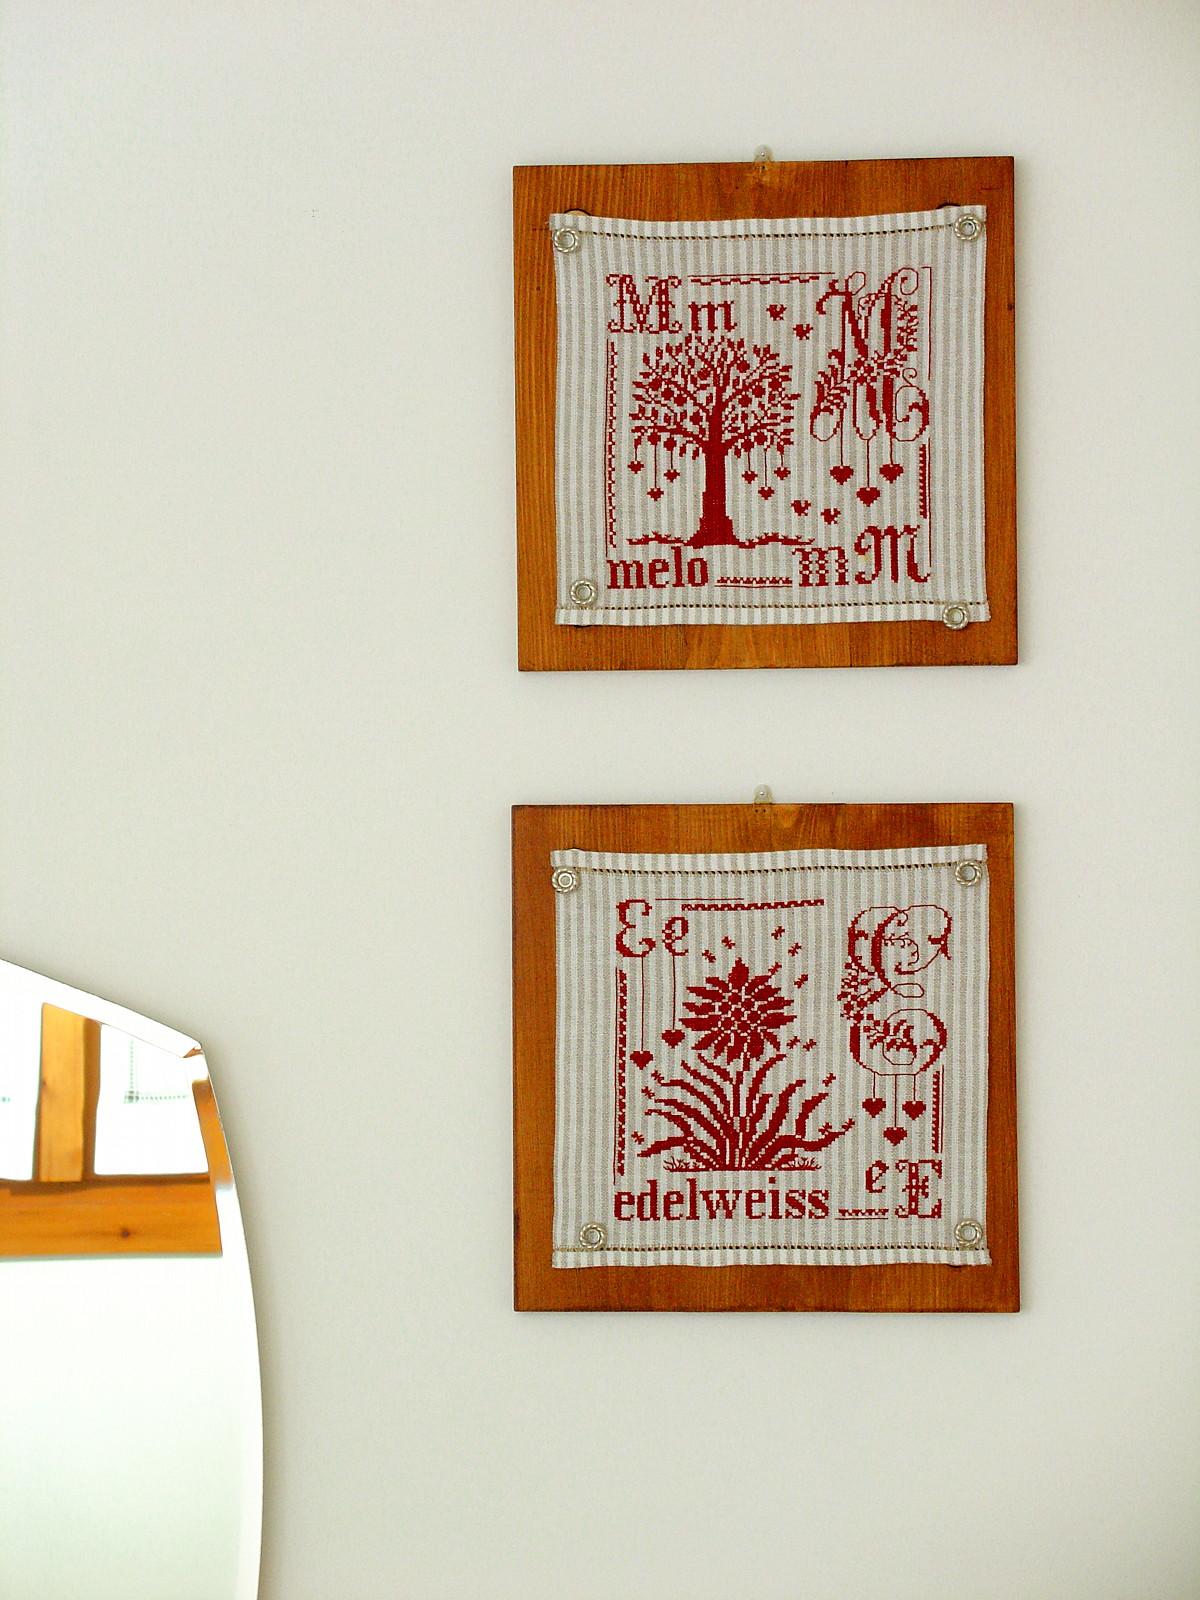 hd wallpapers wiring diagram hair dryer [ 1200 x 1600 Pixel ]